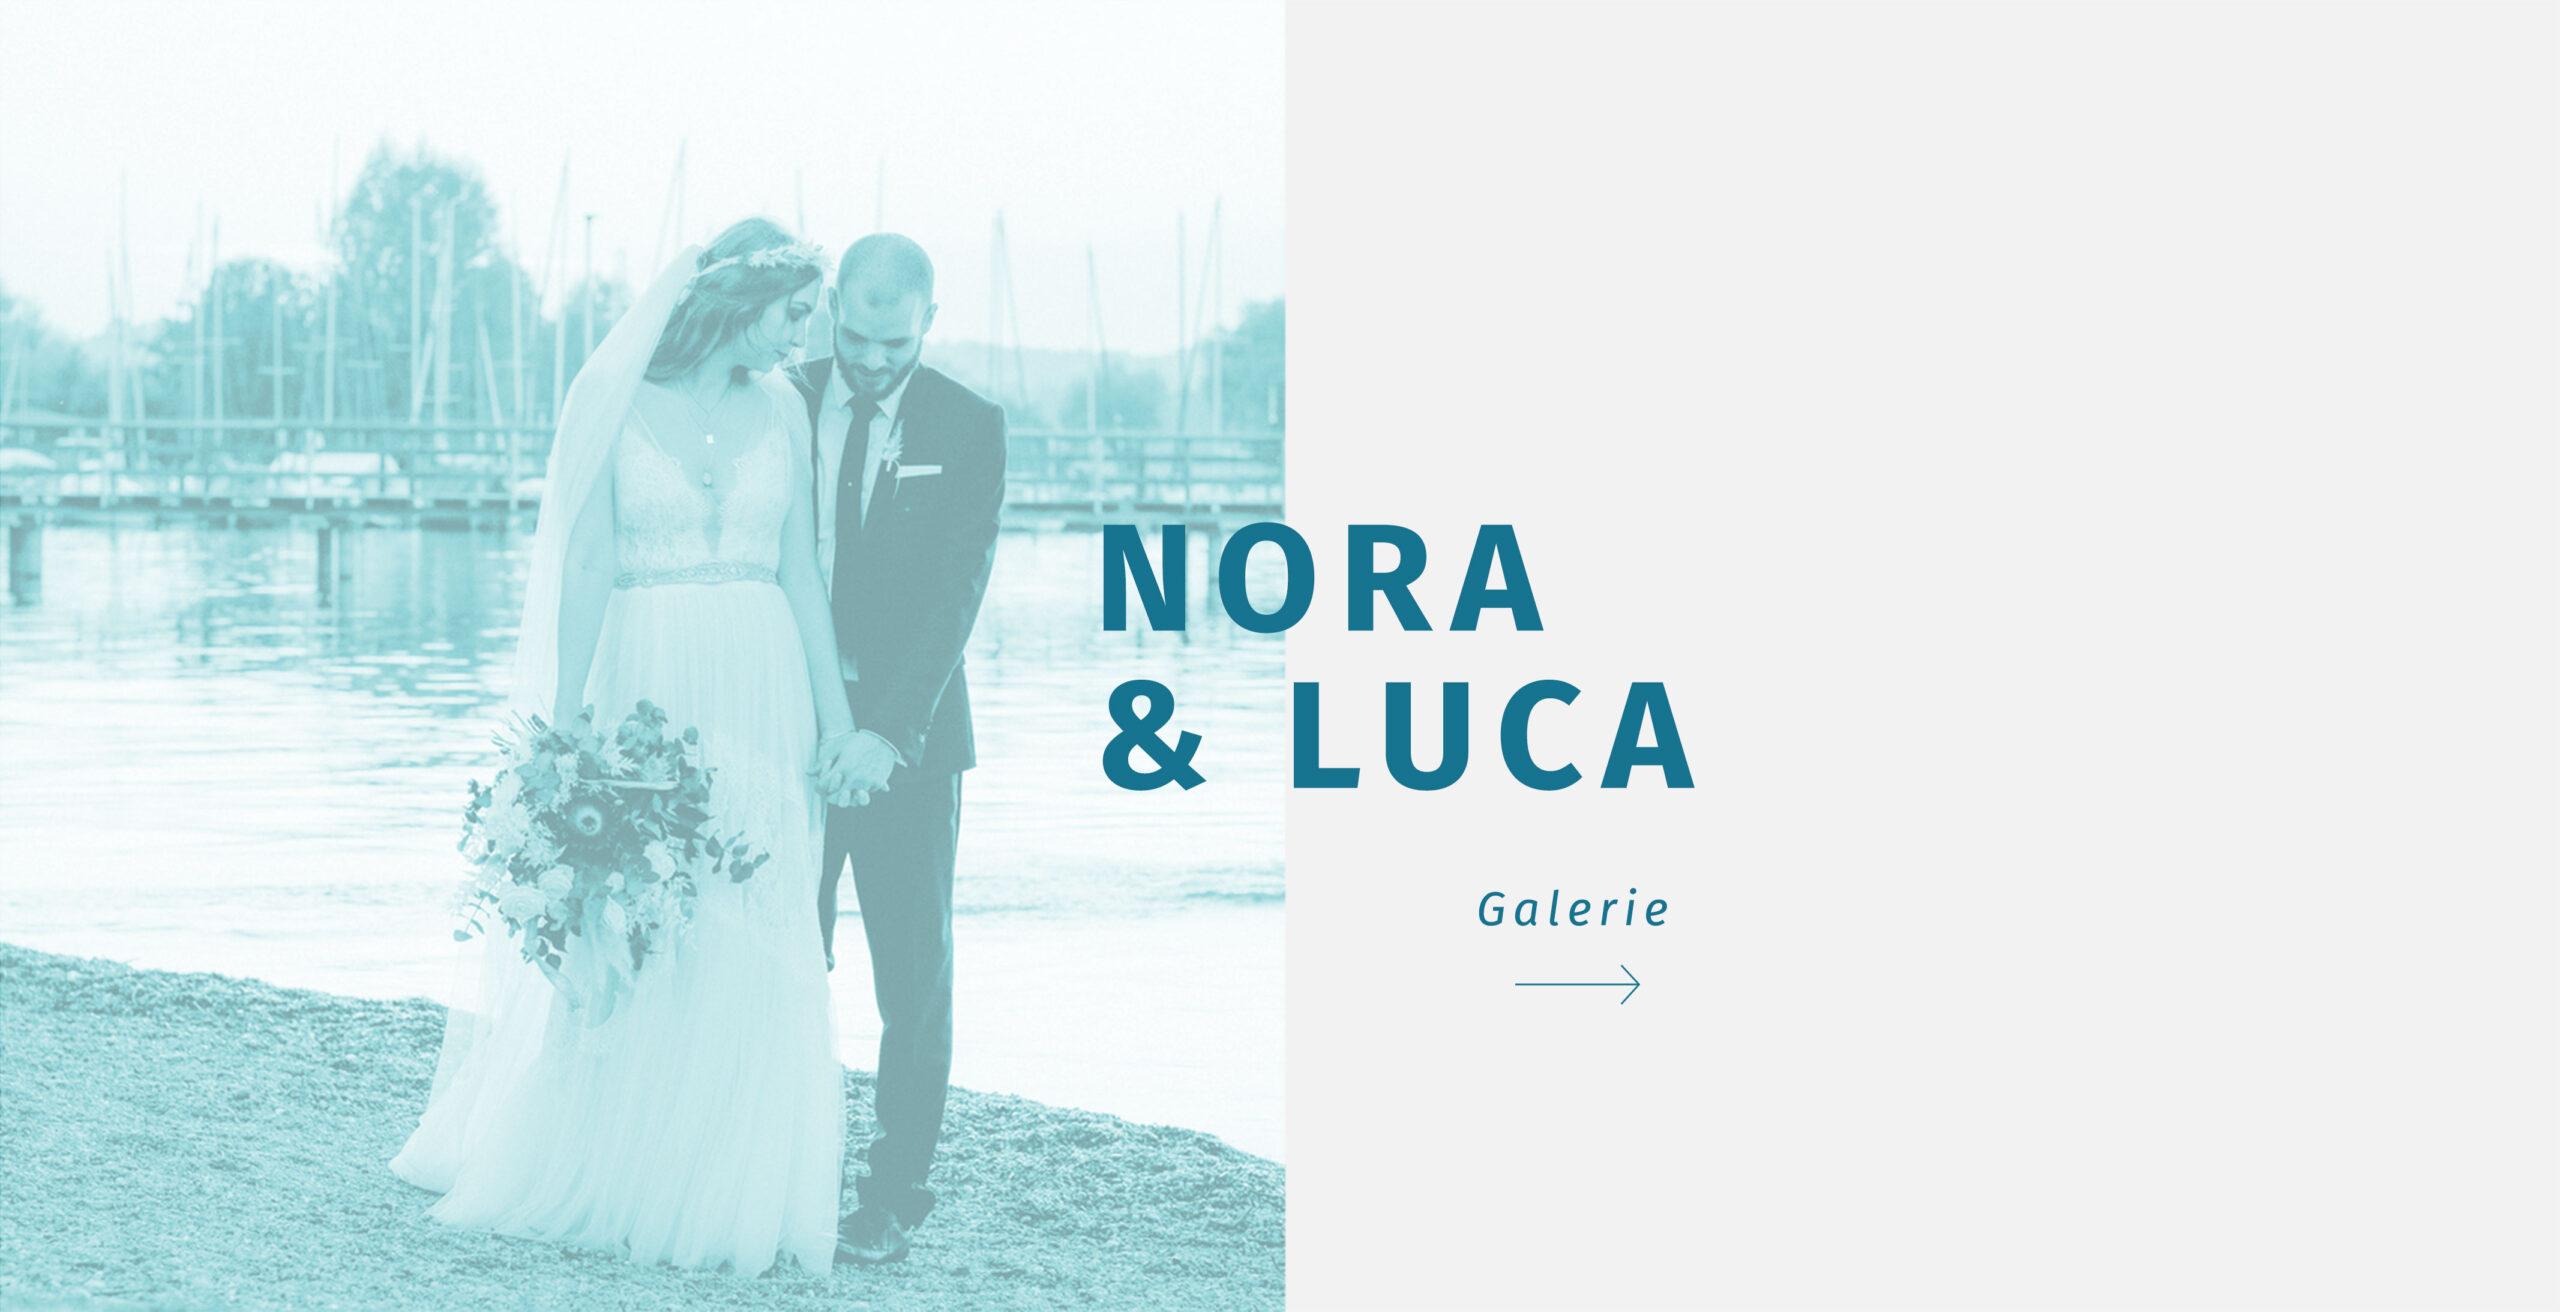 Nora & Luca